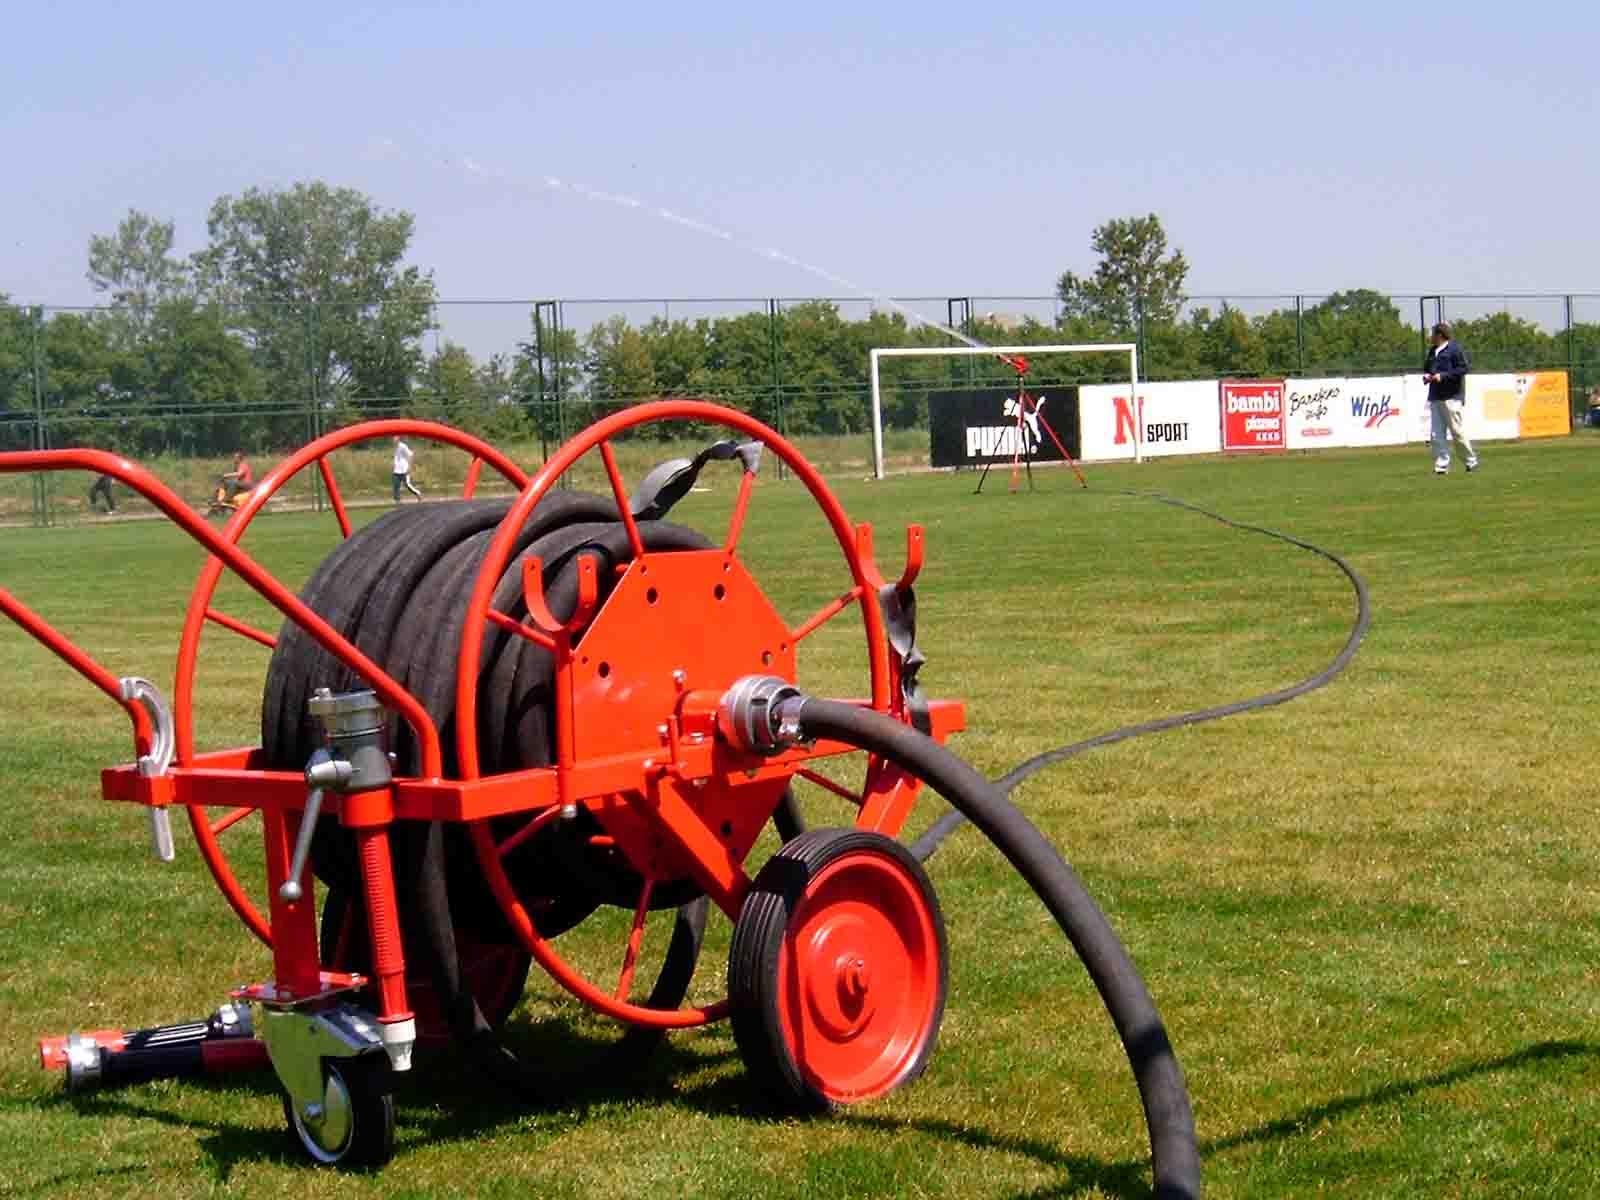 Na poseban zahtev možemo obezbediti i pumpe za druge tečnosti.